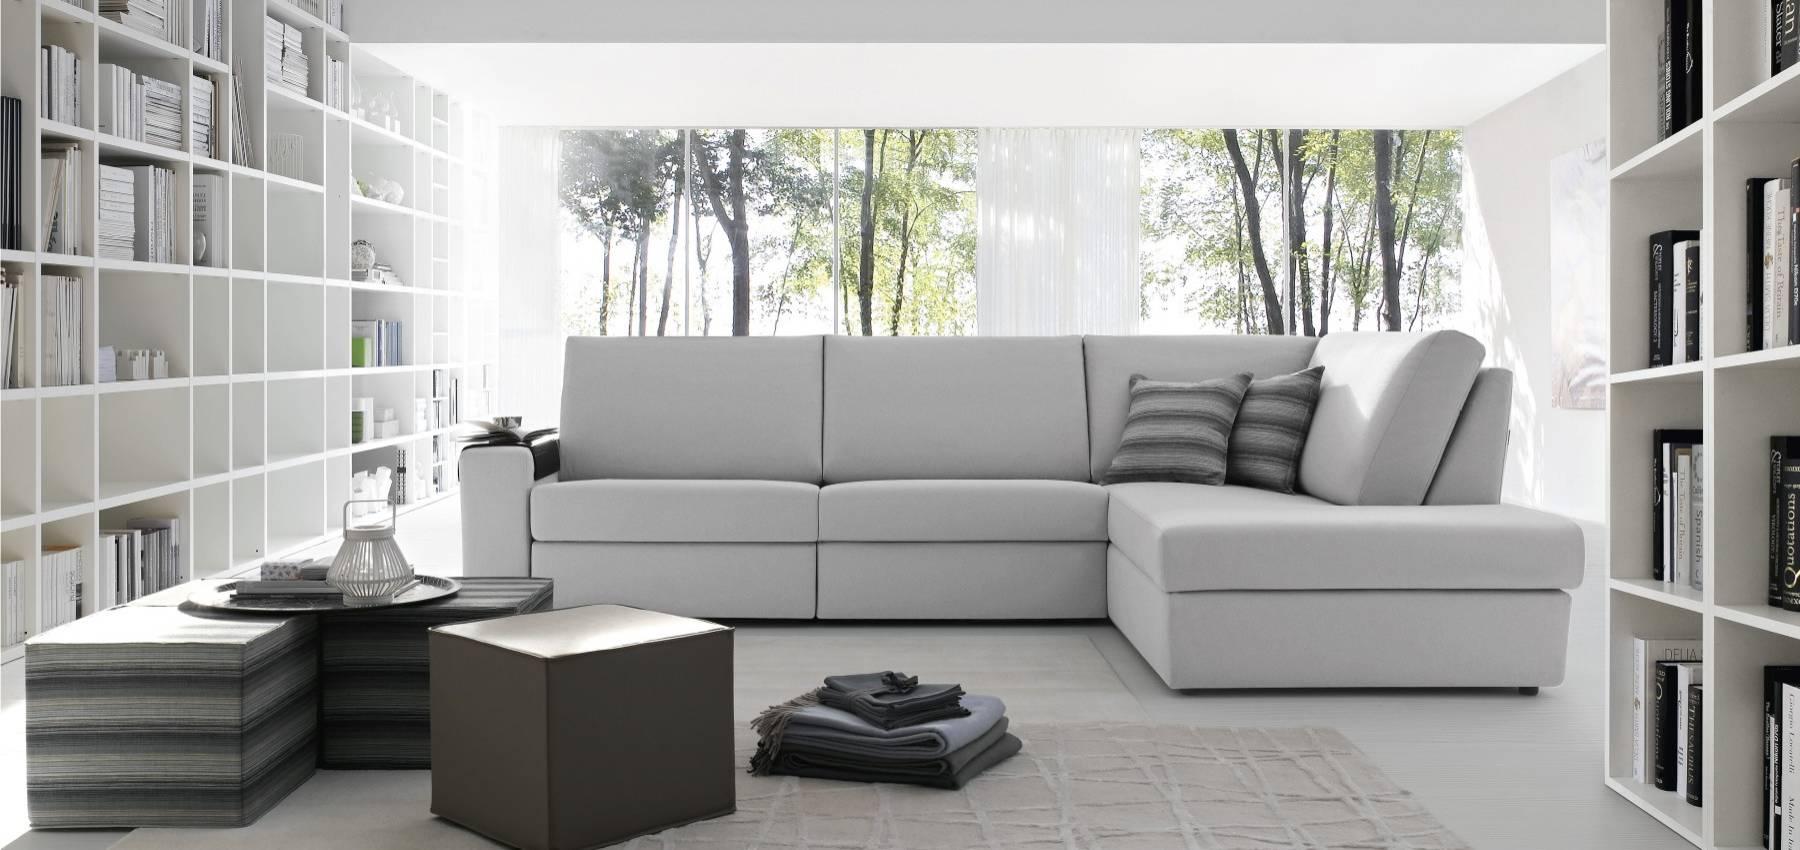 Doimo salotti a enna divani e poltrone mobili incardone for Catalogo divani